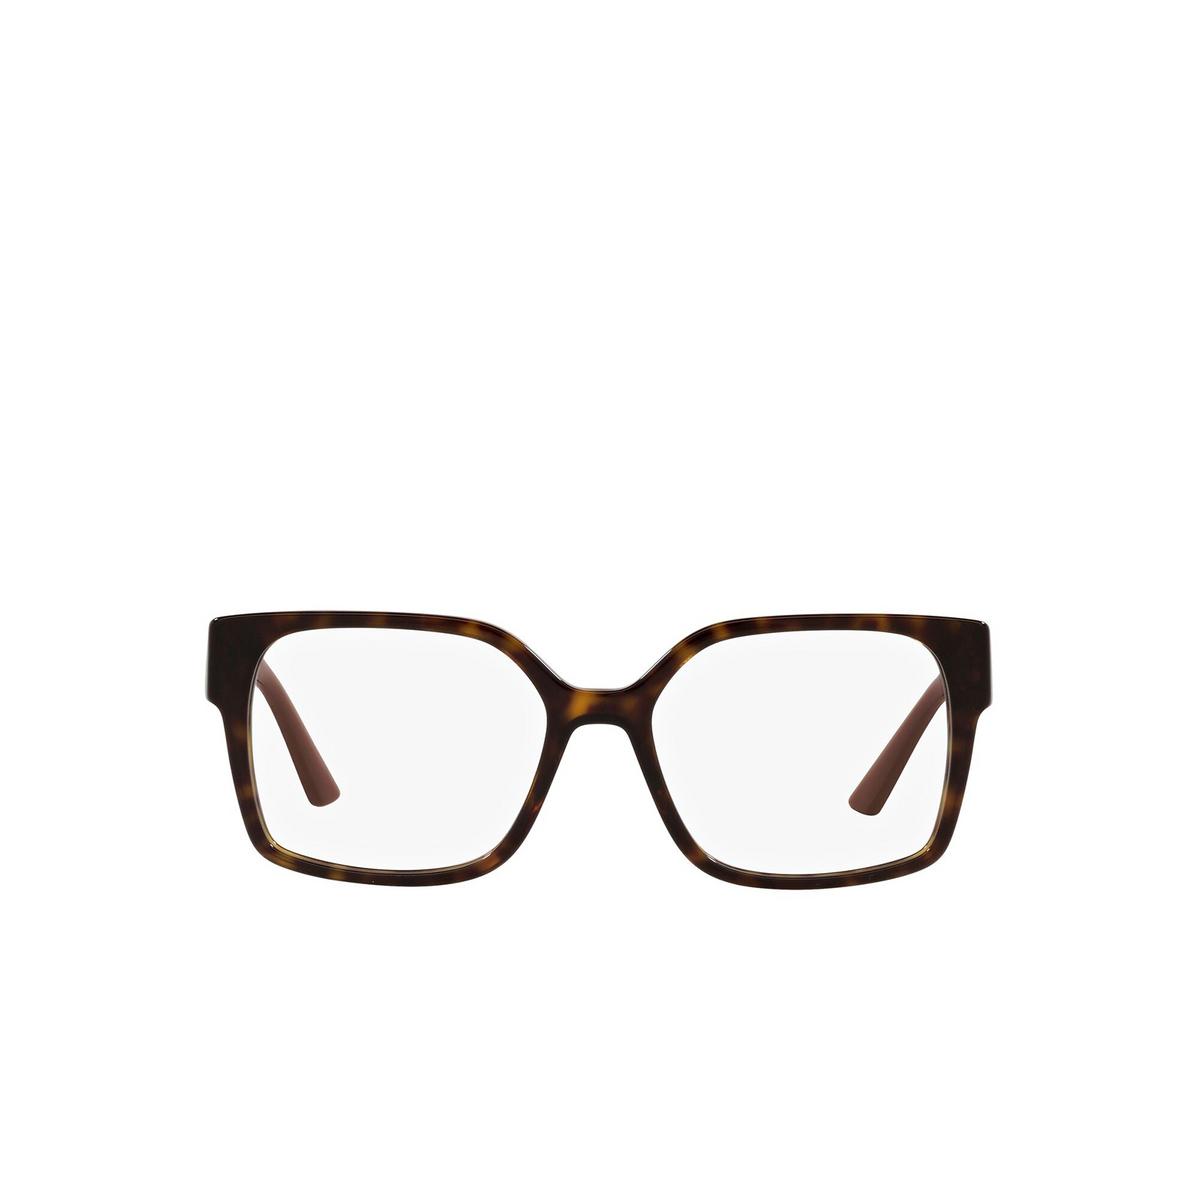 Prada® Square Eyeglasses: PR 10WV color Dark Havana 2AU1O1 - front view.